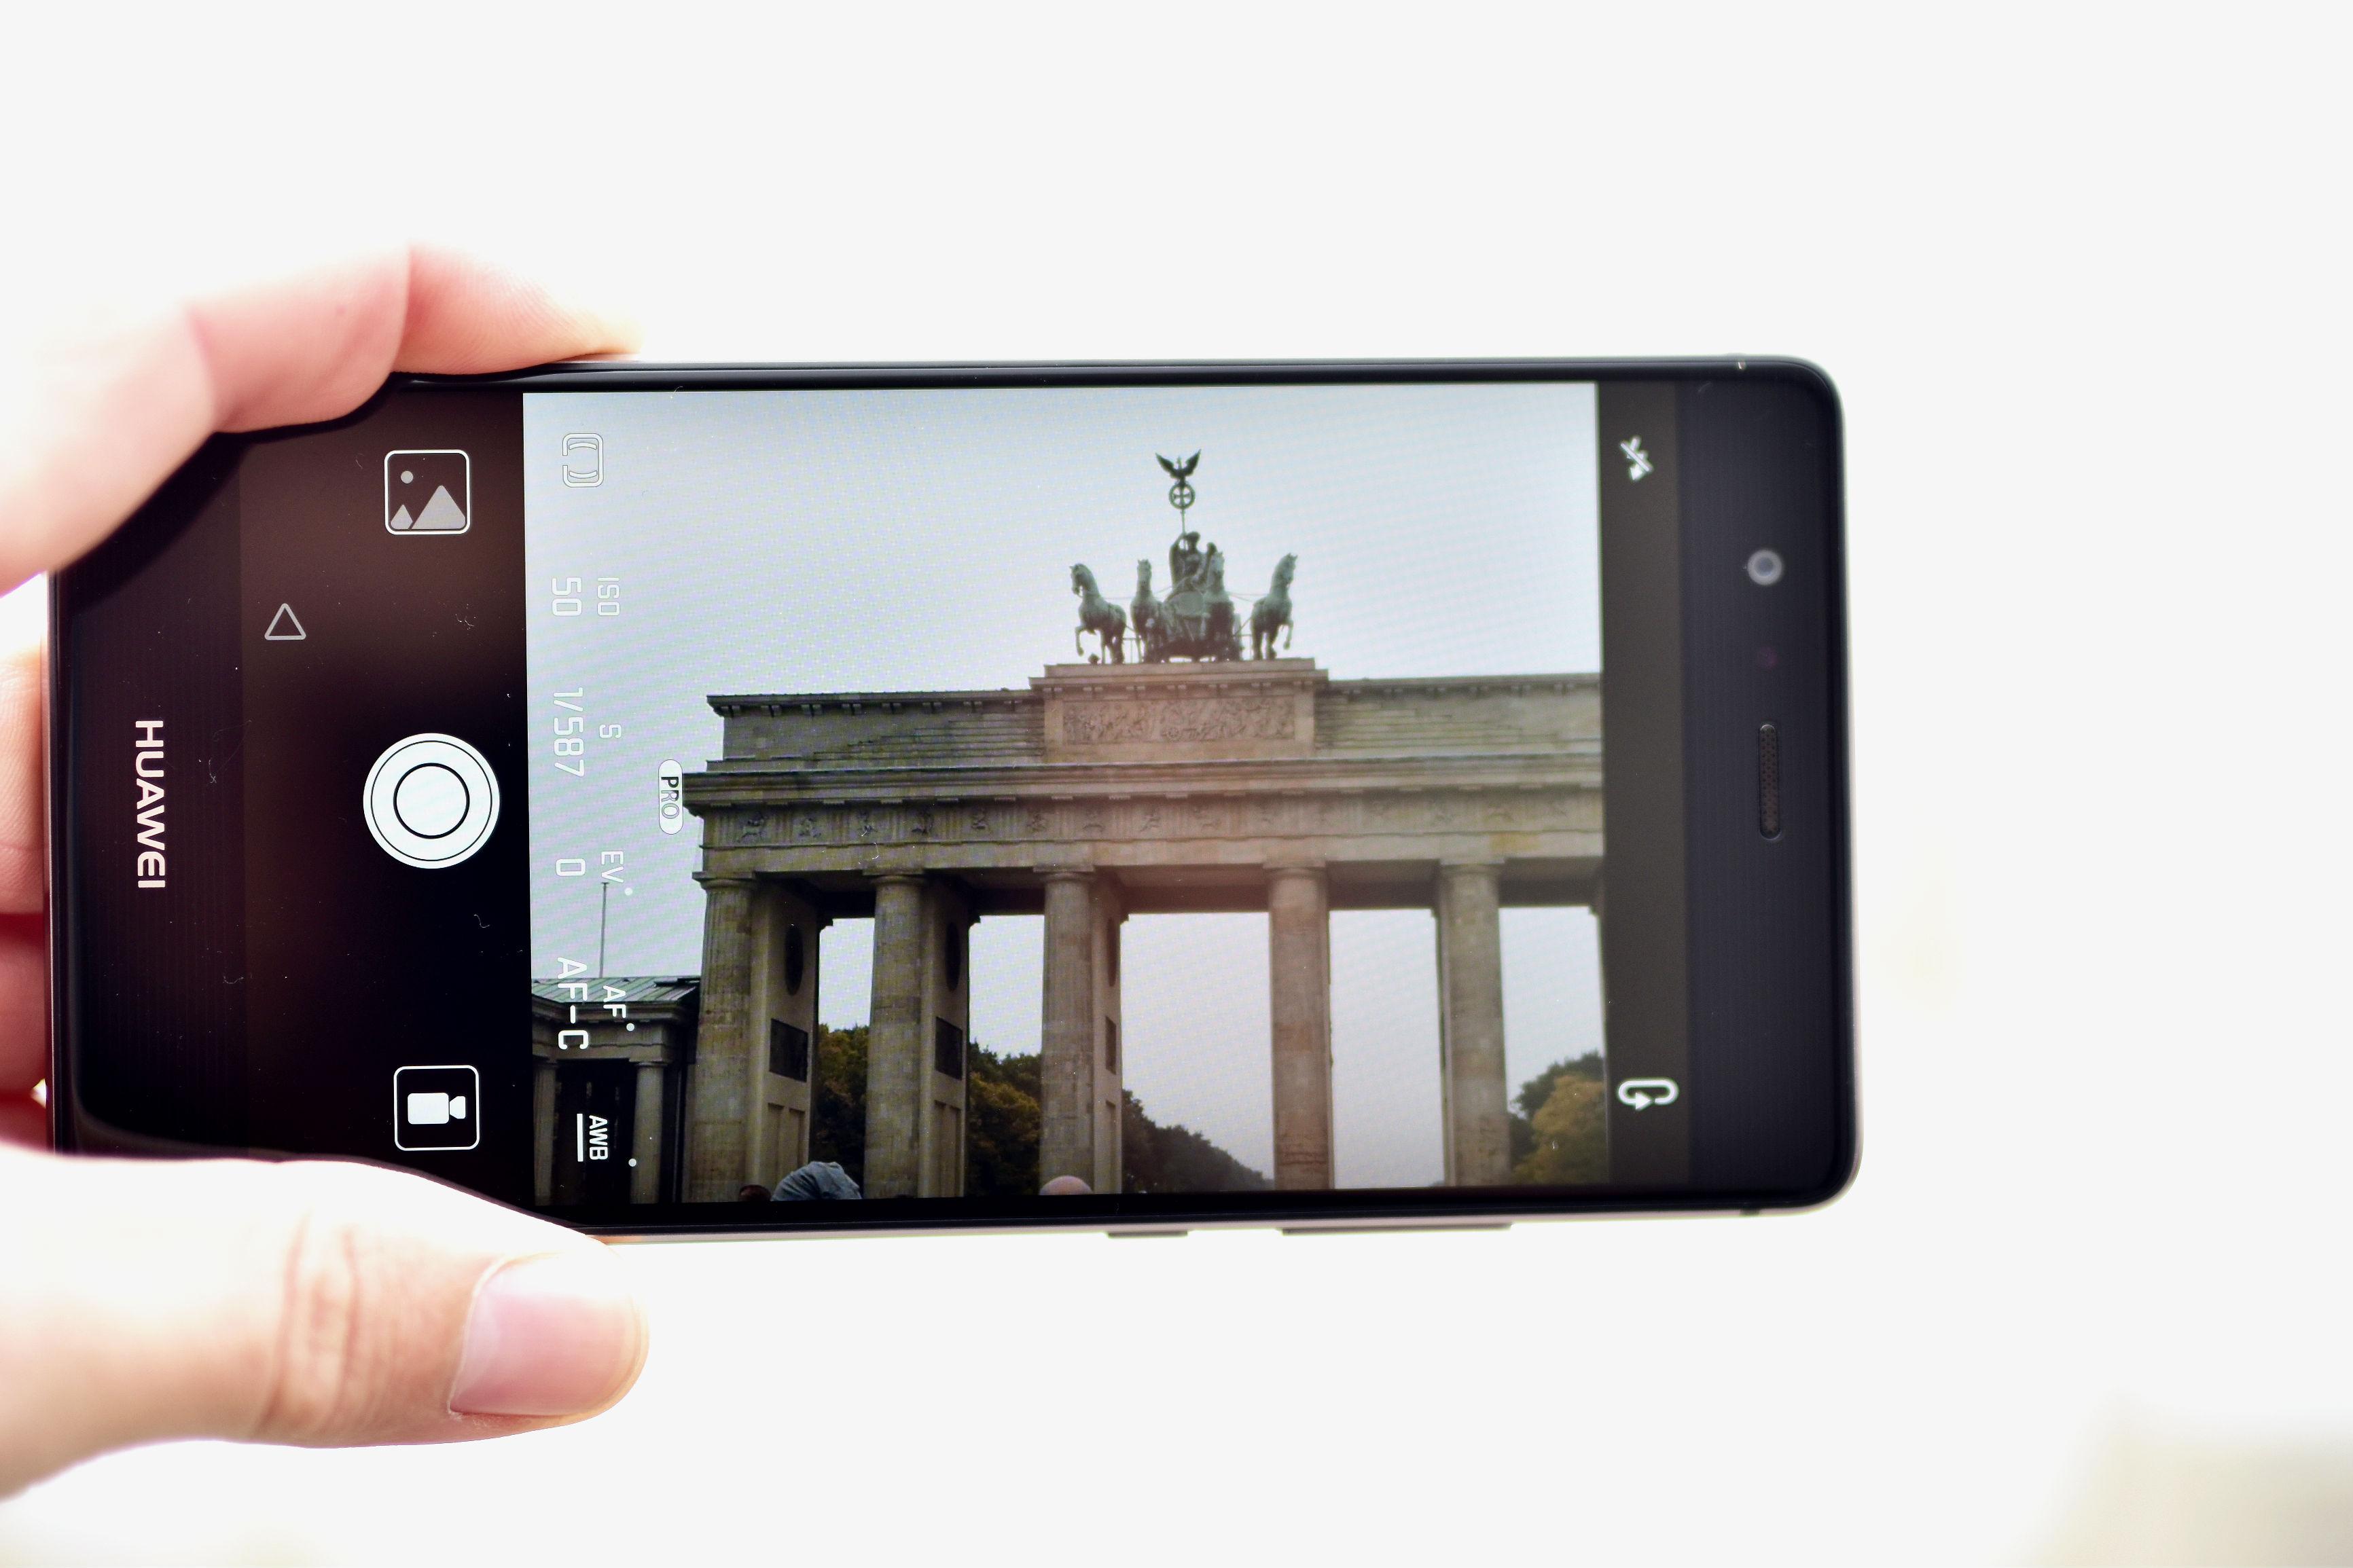 tommeezjerry-styleblog-maennerblog-maenner-modeblog-berlin-berlinblog-maennermodeblog-outfit-huawei-p9-smartphone-handy-trenchcoat-allblack-bruno-banani-streetstyelook-